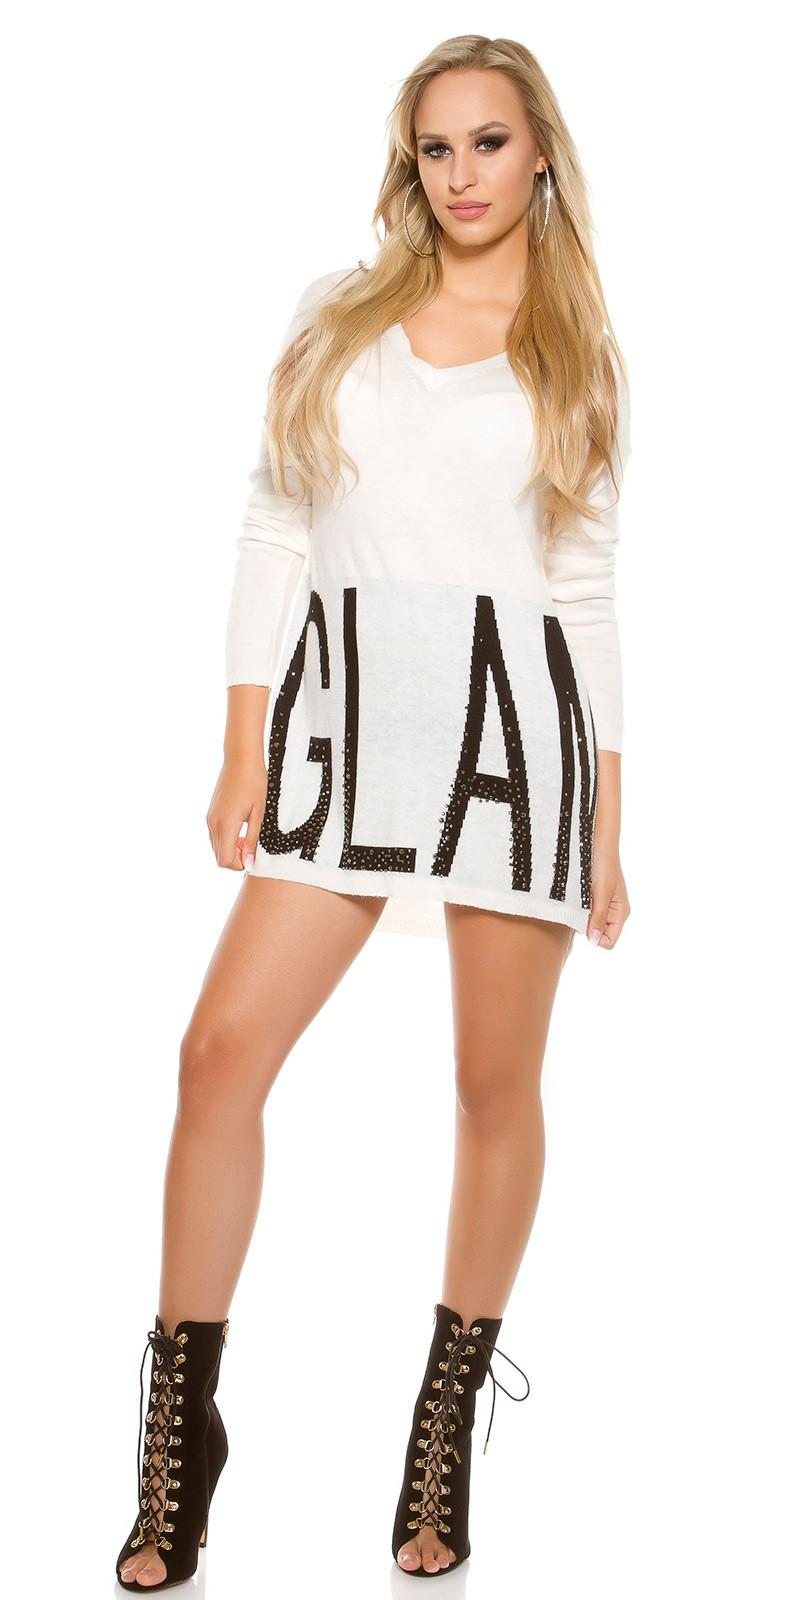 pantofi cei mai buni prețuri incredibile vânzare Statele Unite online Oversize pulóver KouCla Glam White – Sissy Boutique